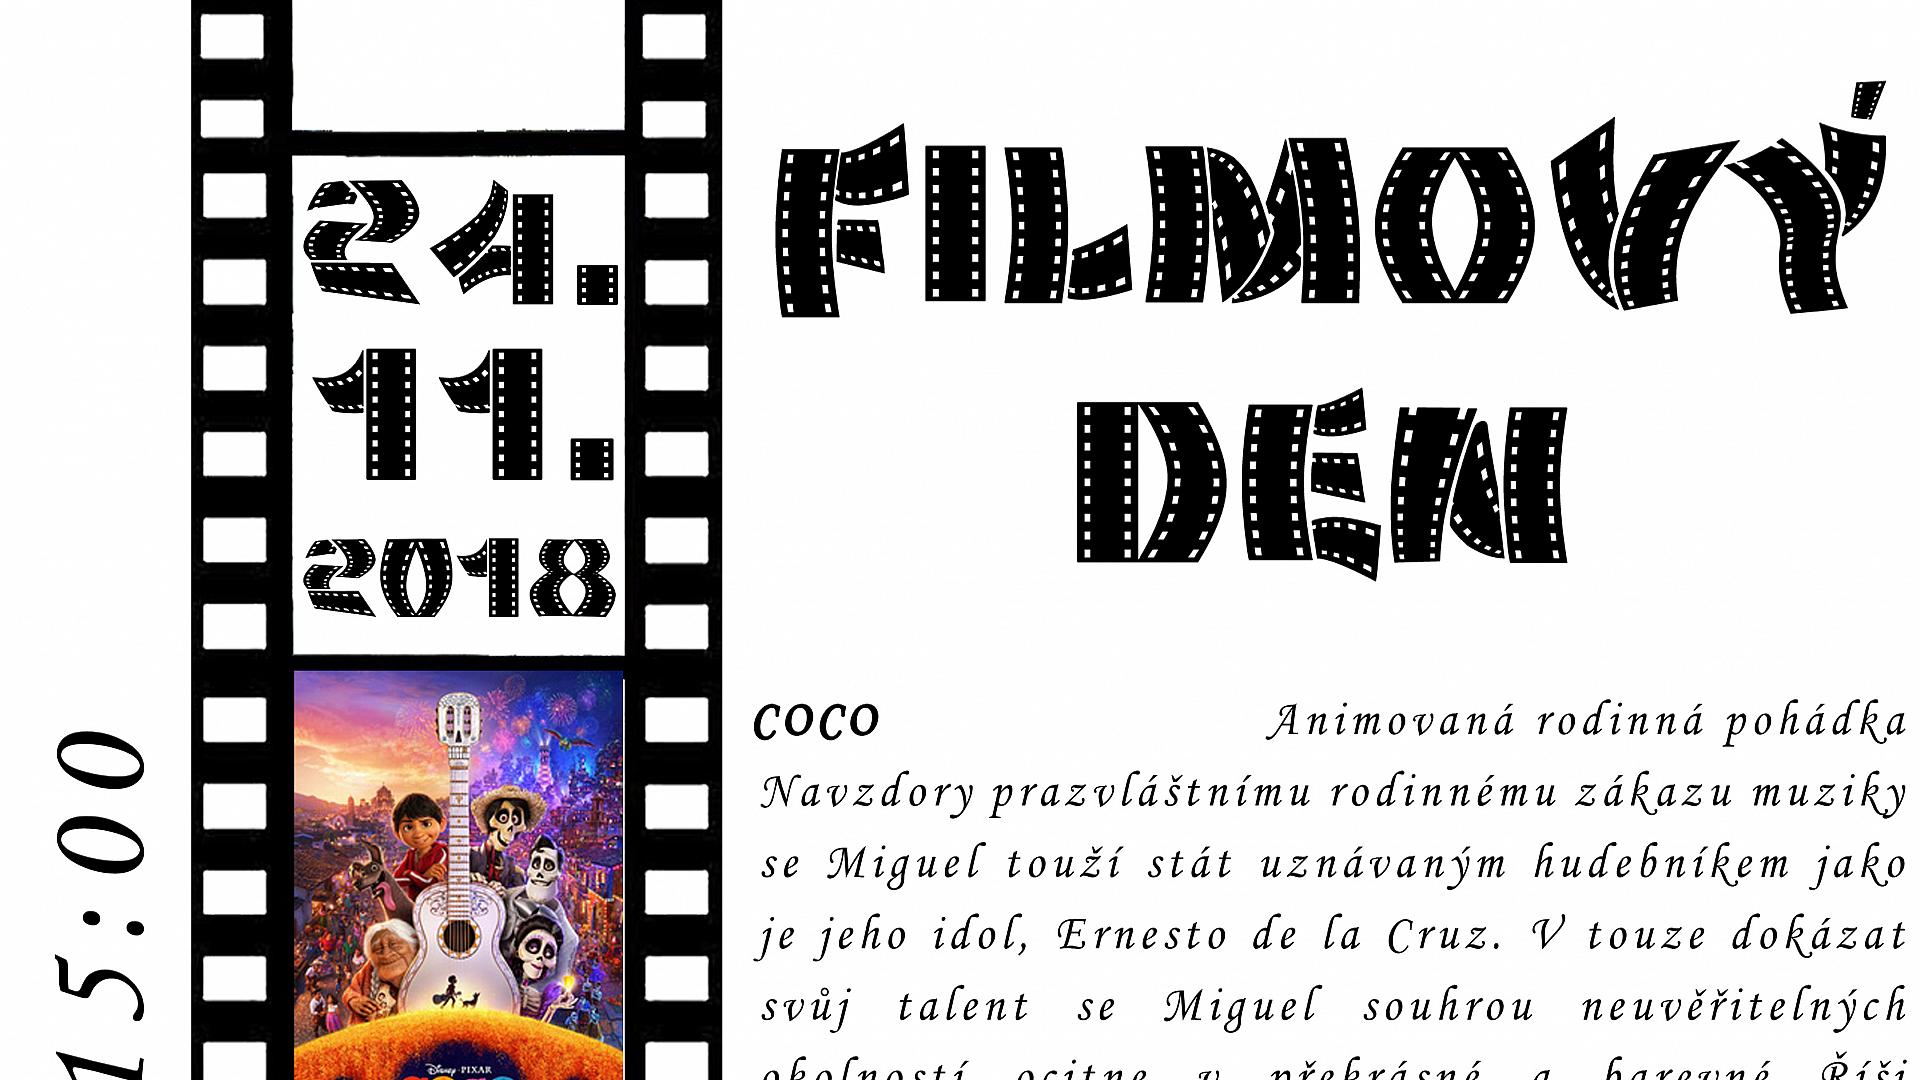 Obec Tichá - Filmový den 24.11.2018